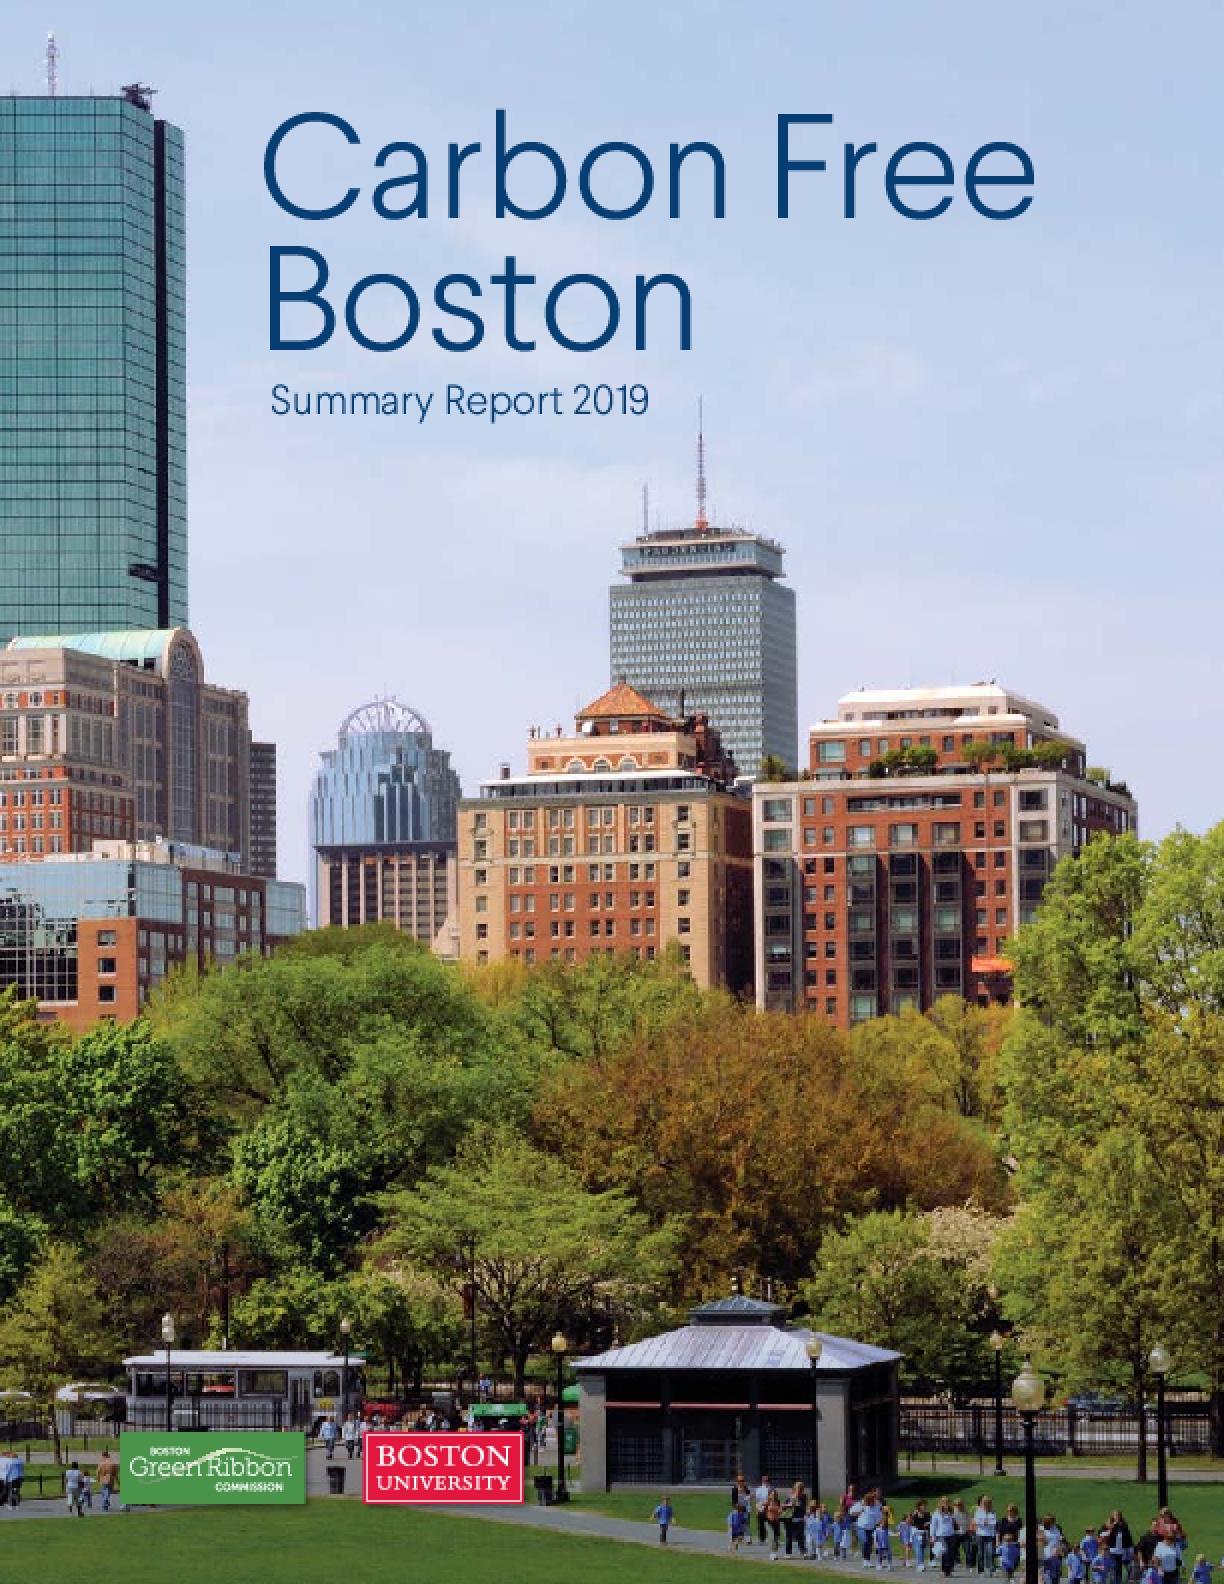 Carbon Free Boston: Summary Report 2019